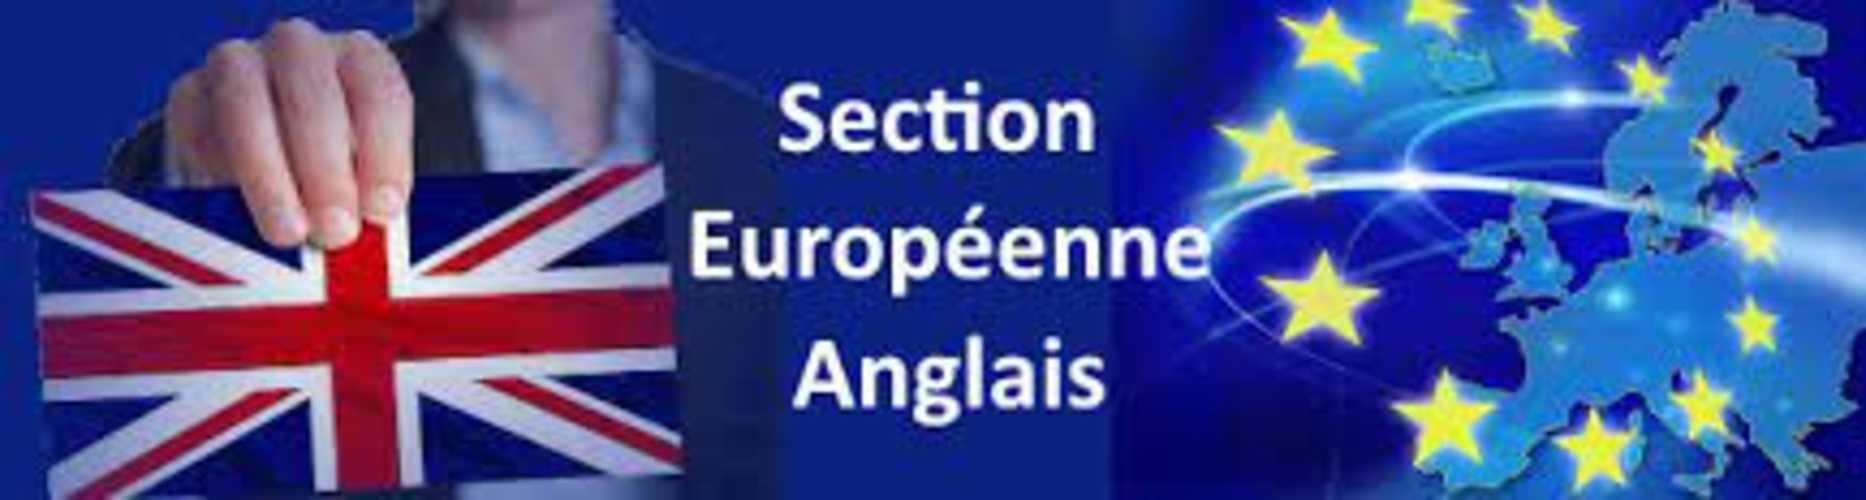 Section européenne anglais 0